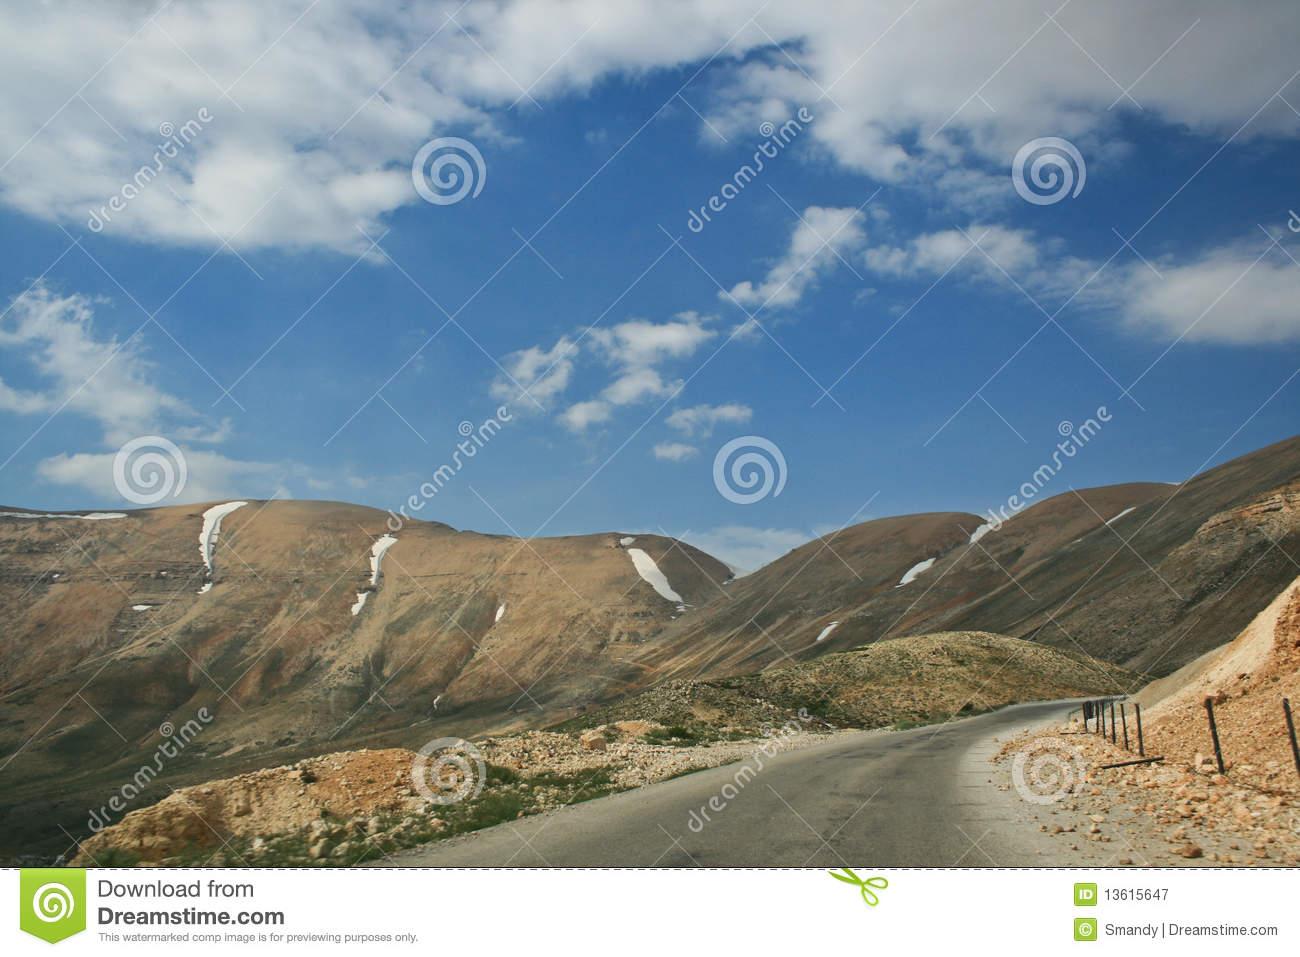 Mountain Road On The Highest Peak Of Lebanon Royalty Free Stock.